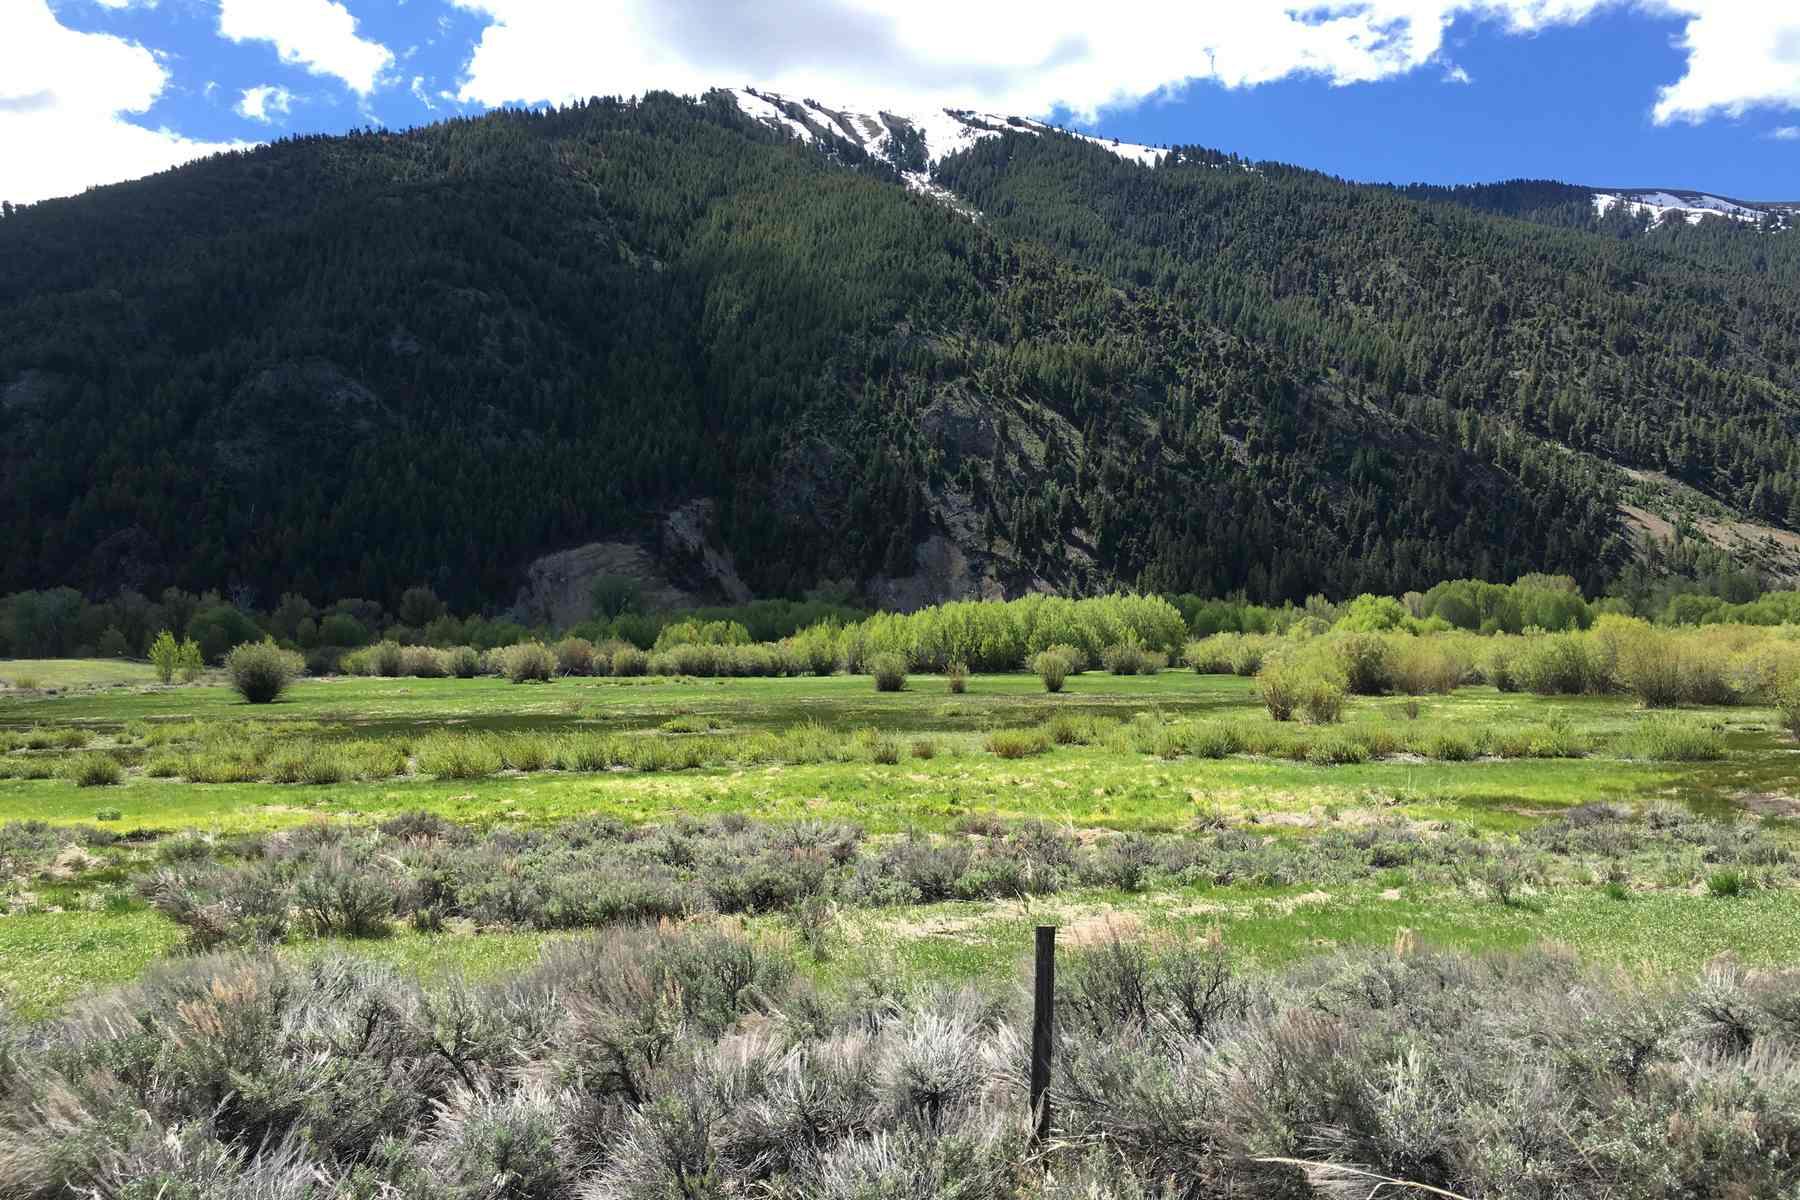 Terreno por un Venta en East Fork Land 512 East Fork Road Hailey, Idaho, 83333 Estados Unidos